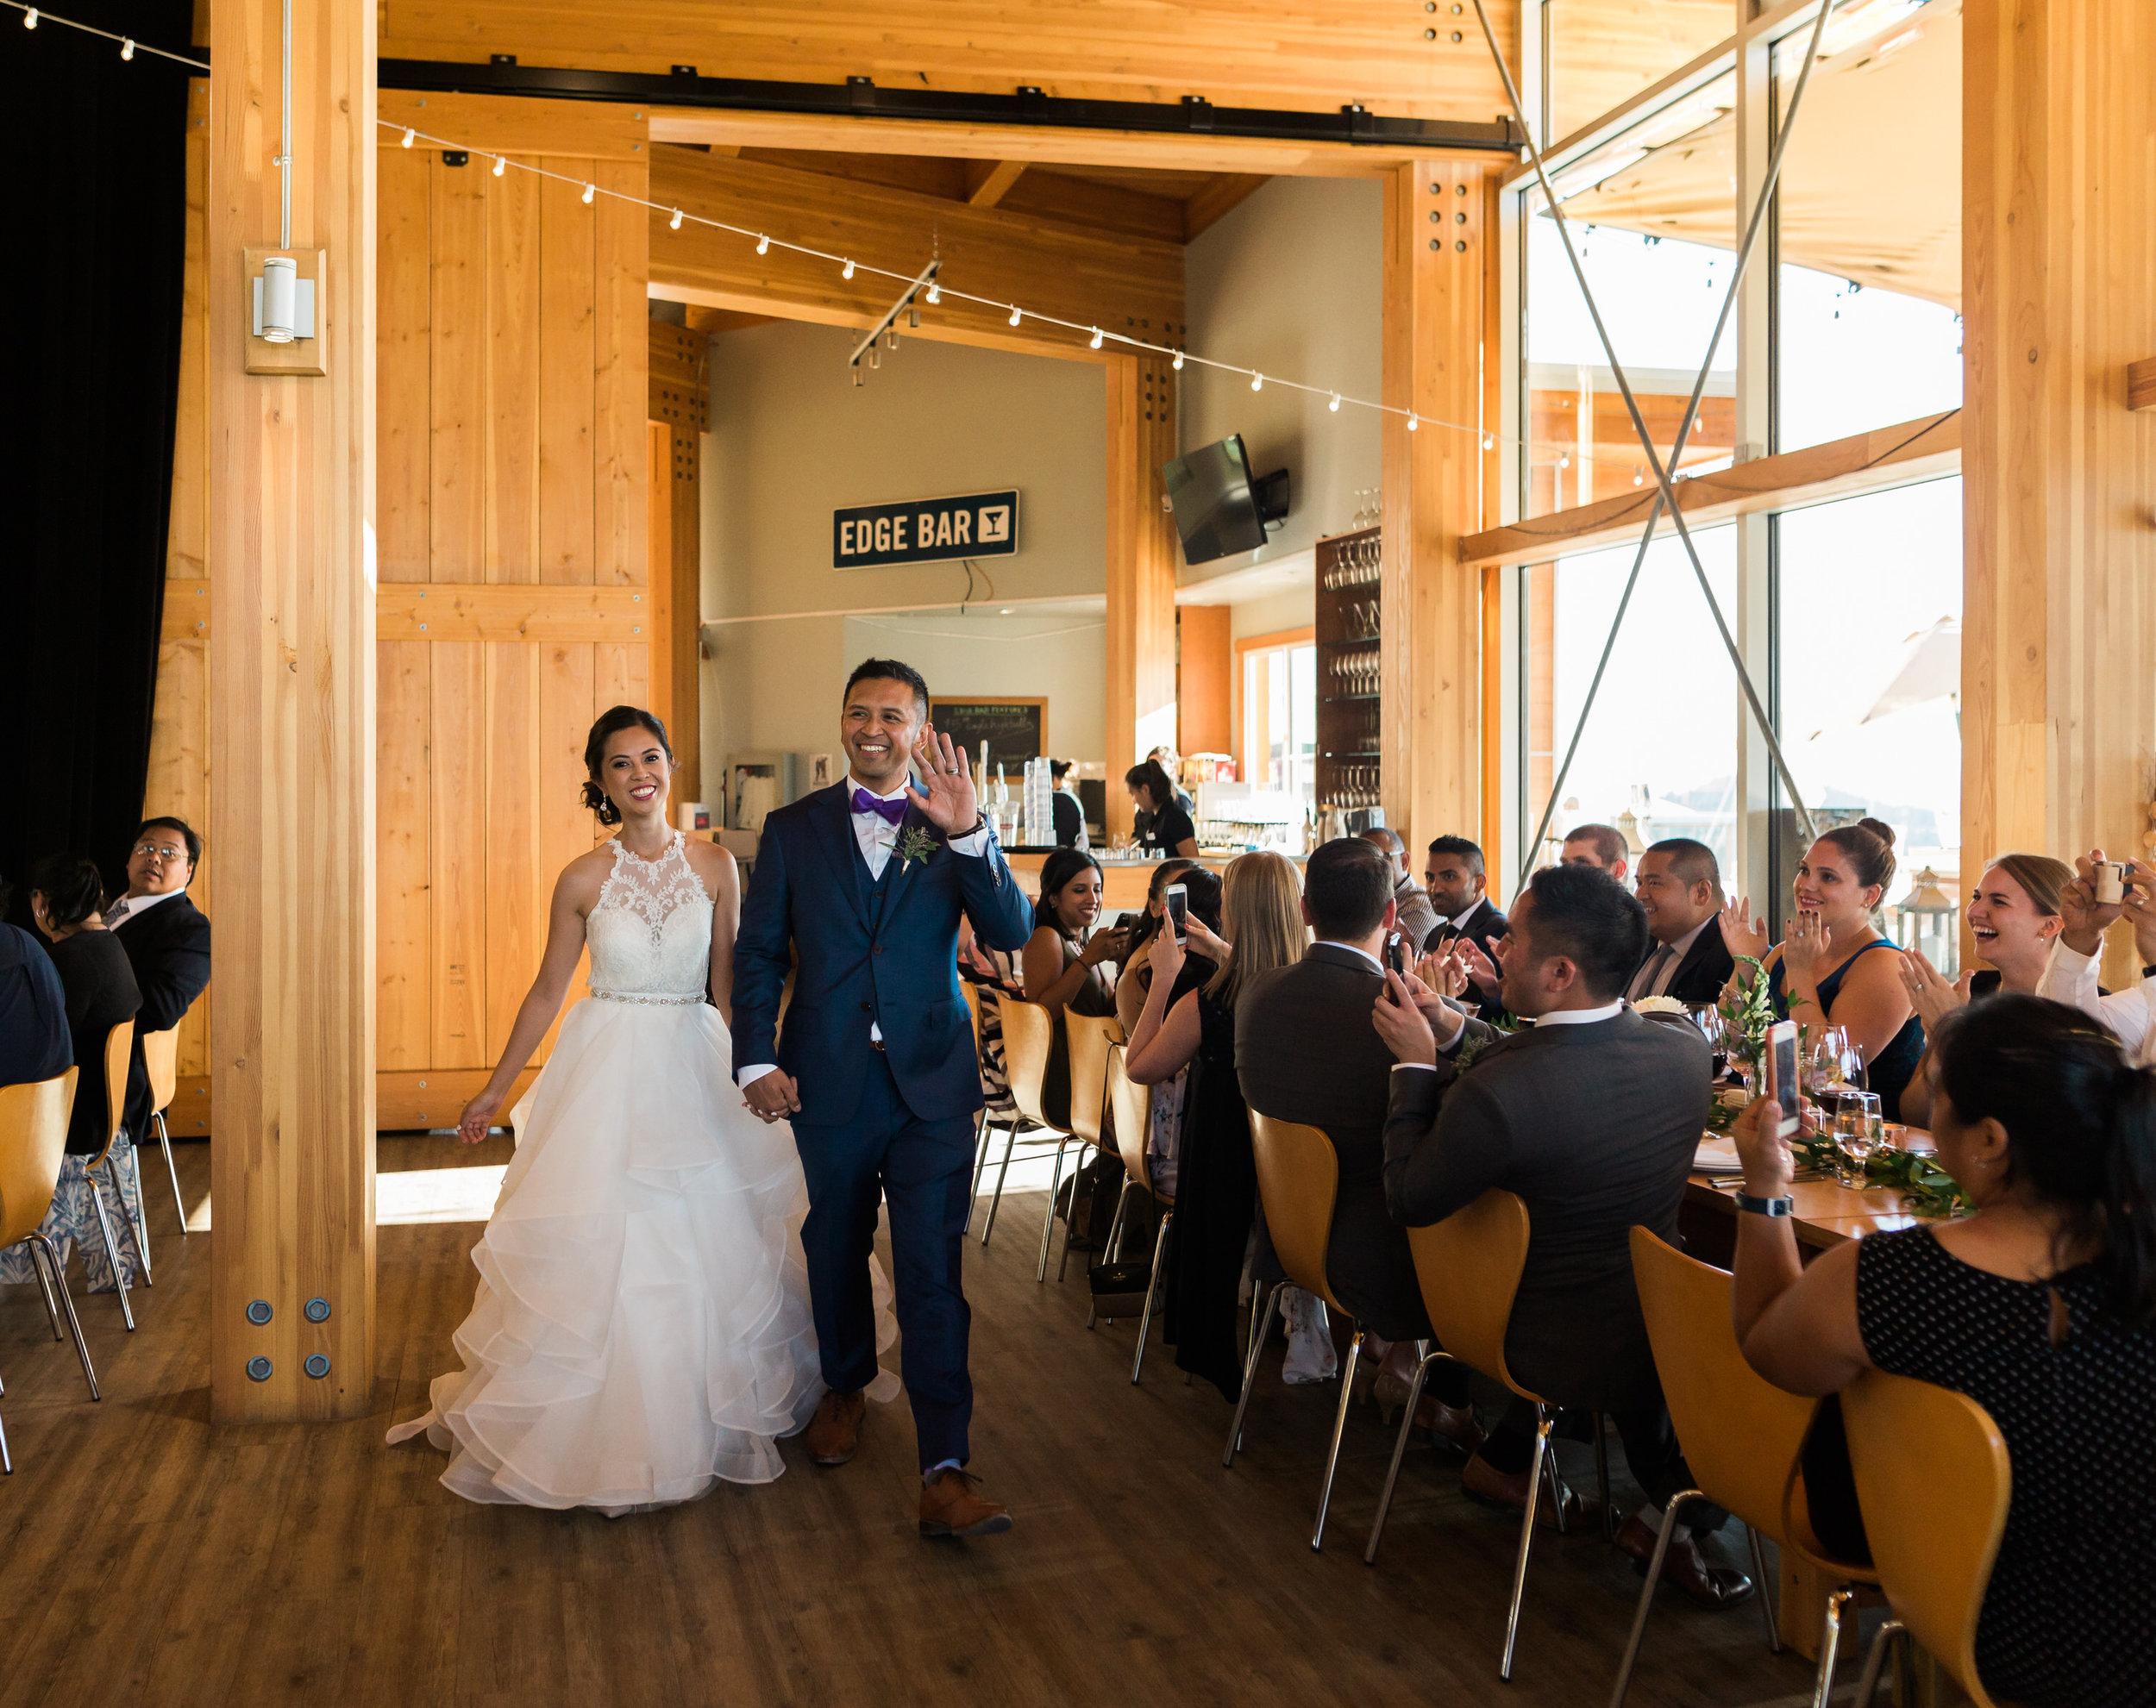 Squamish Wedding Photographer - Sea to Sky Gondola Wedding Photos -  Vancouver Wedding Photographer & Videographer - Sunshine Coast Wedding Photos - Sunshine Coast Wedding Photographer - Jennifer Picard Photography - IMG_4371.jpg